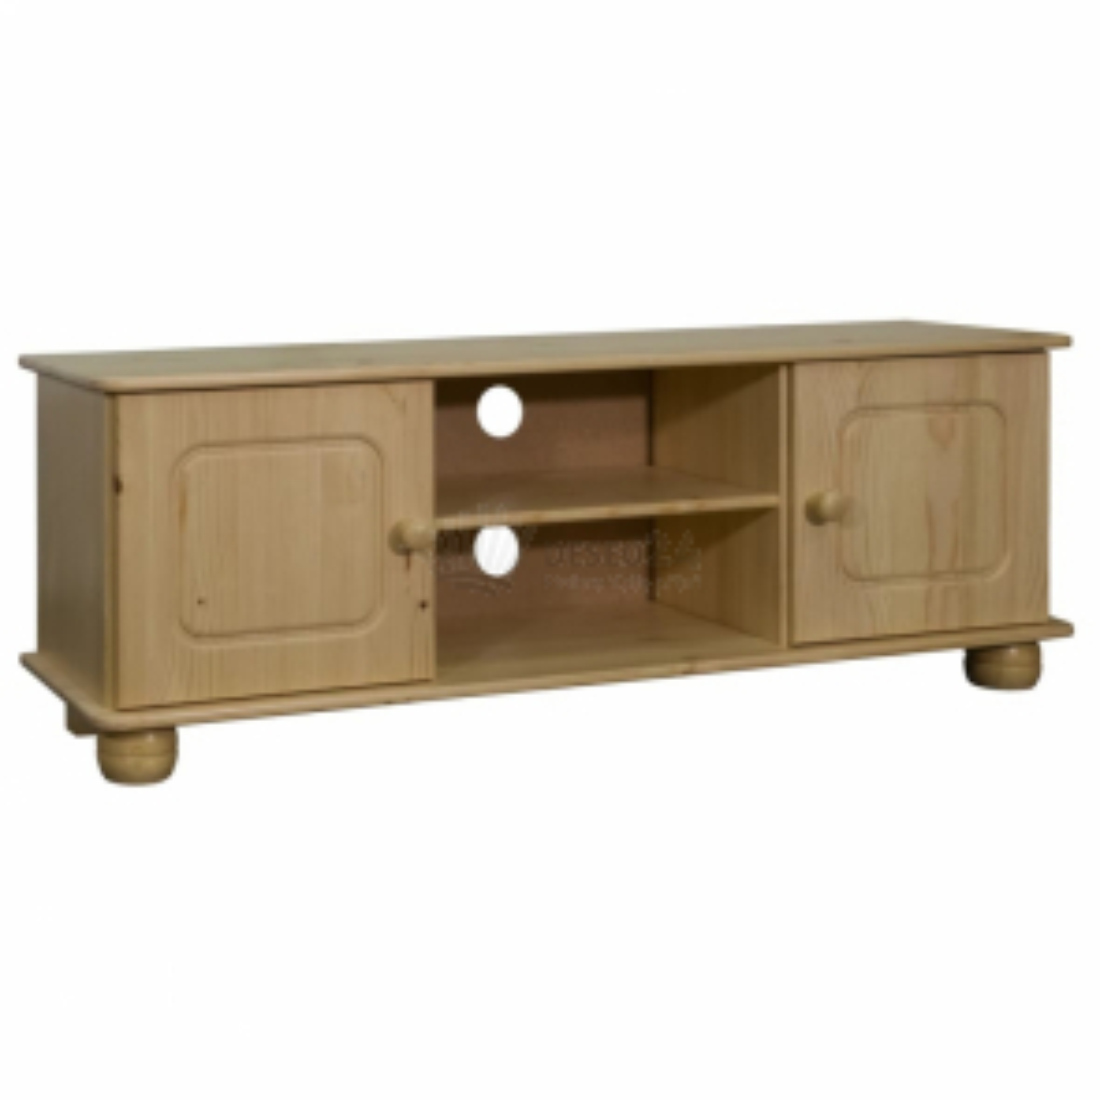 vidaXL TV stolek 115 x 29 x 40 cm masivní borovice [325526]